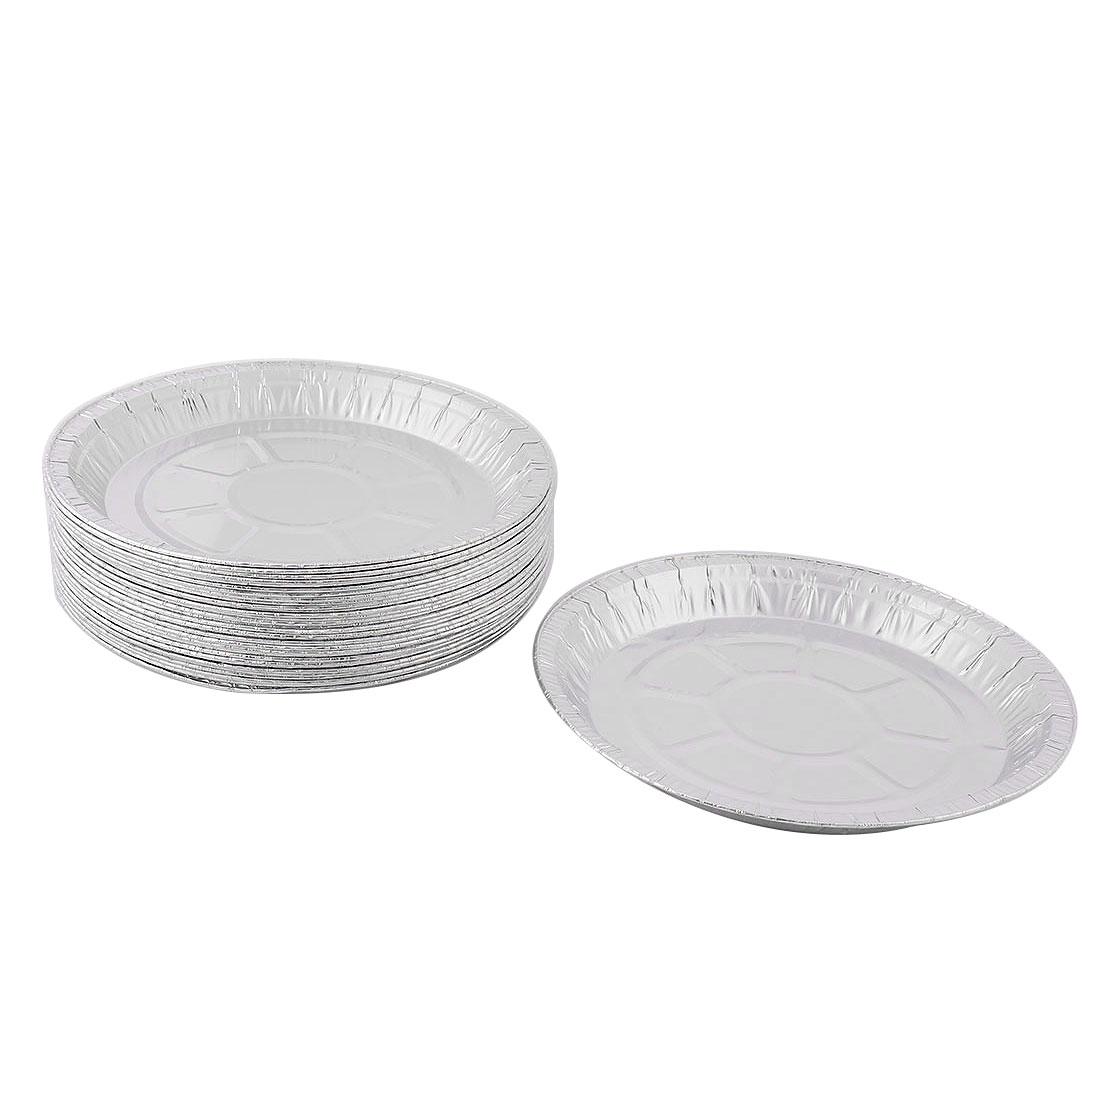 Kitchen Flatware Aluminum Foil Round Shaped Baking Container Silver Tone 32pcs